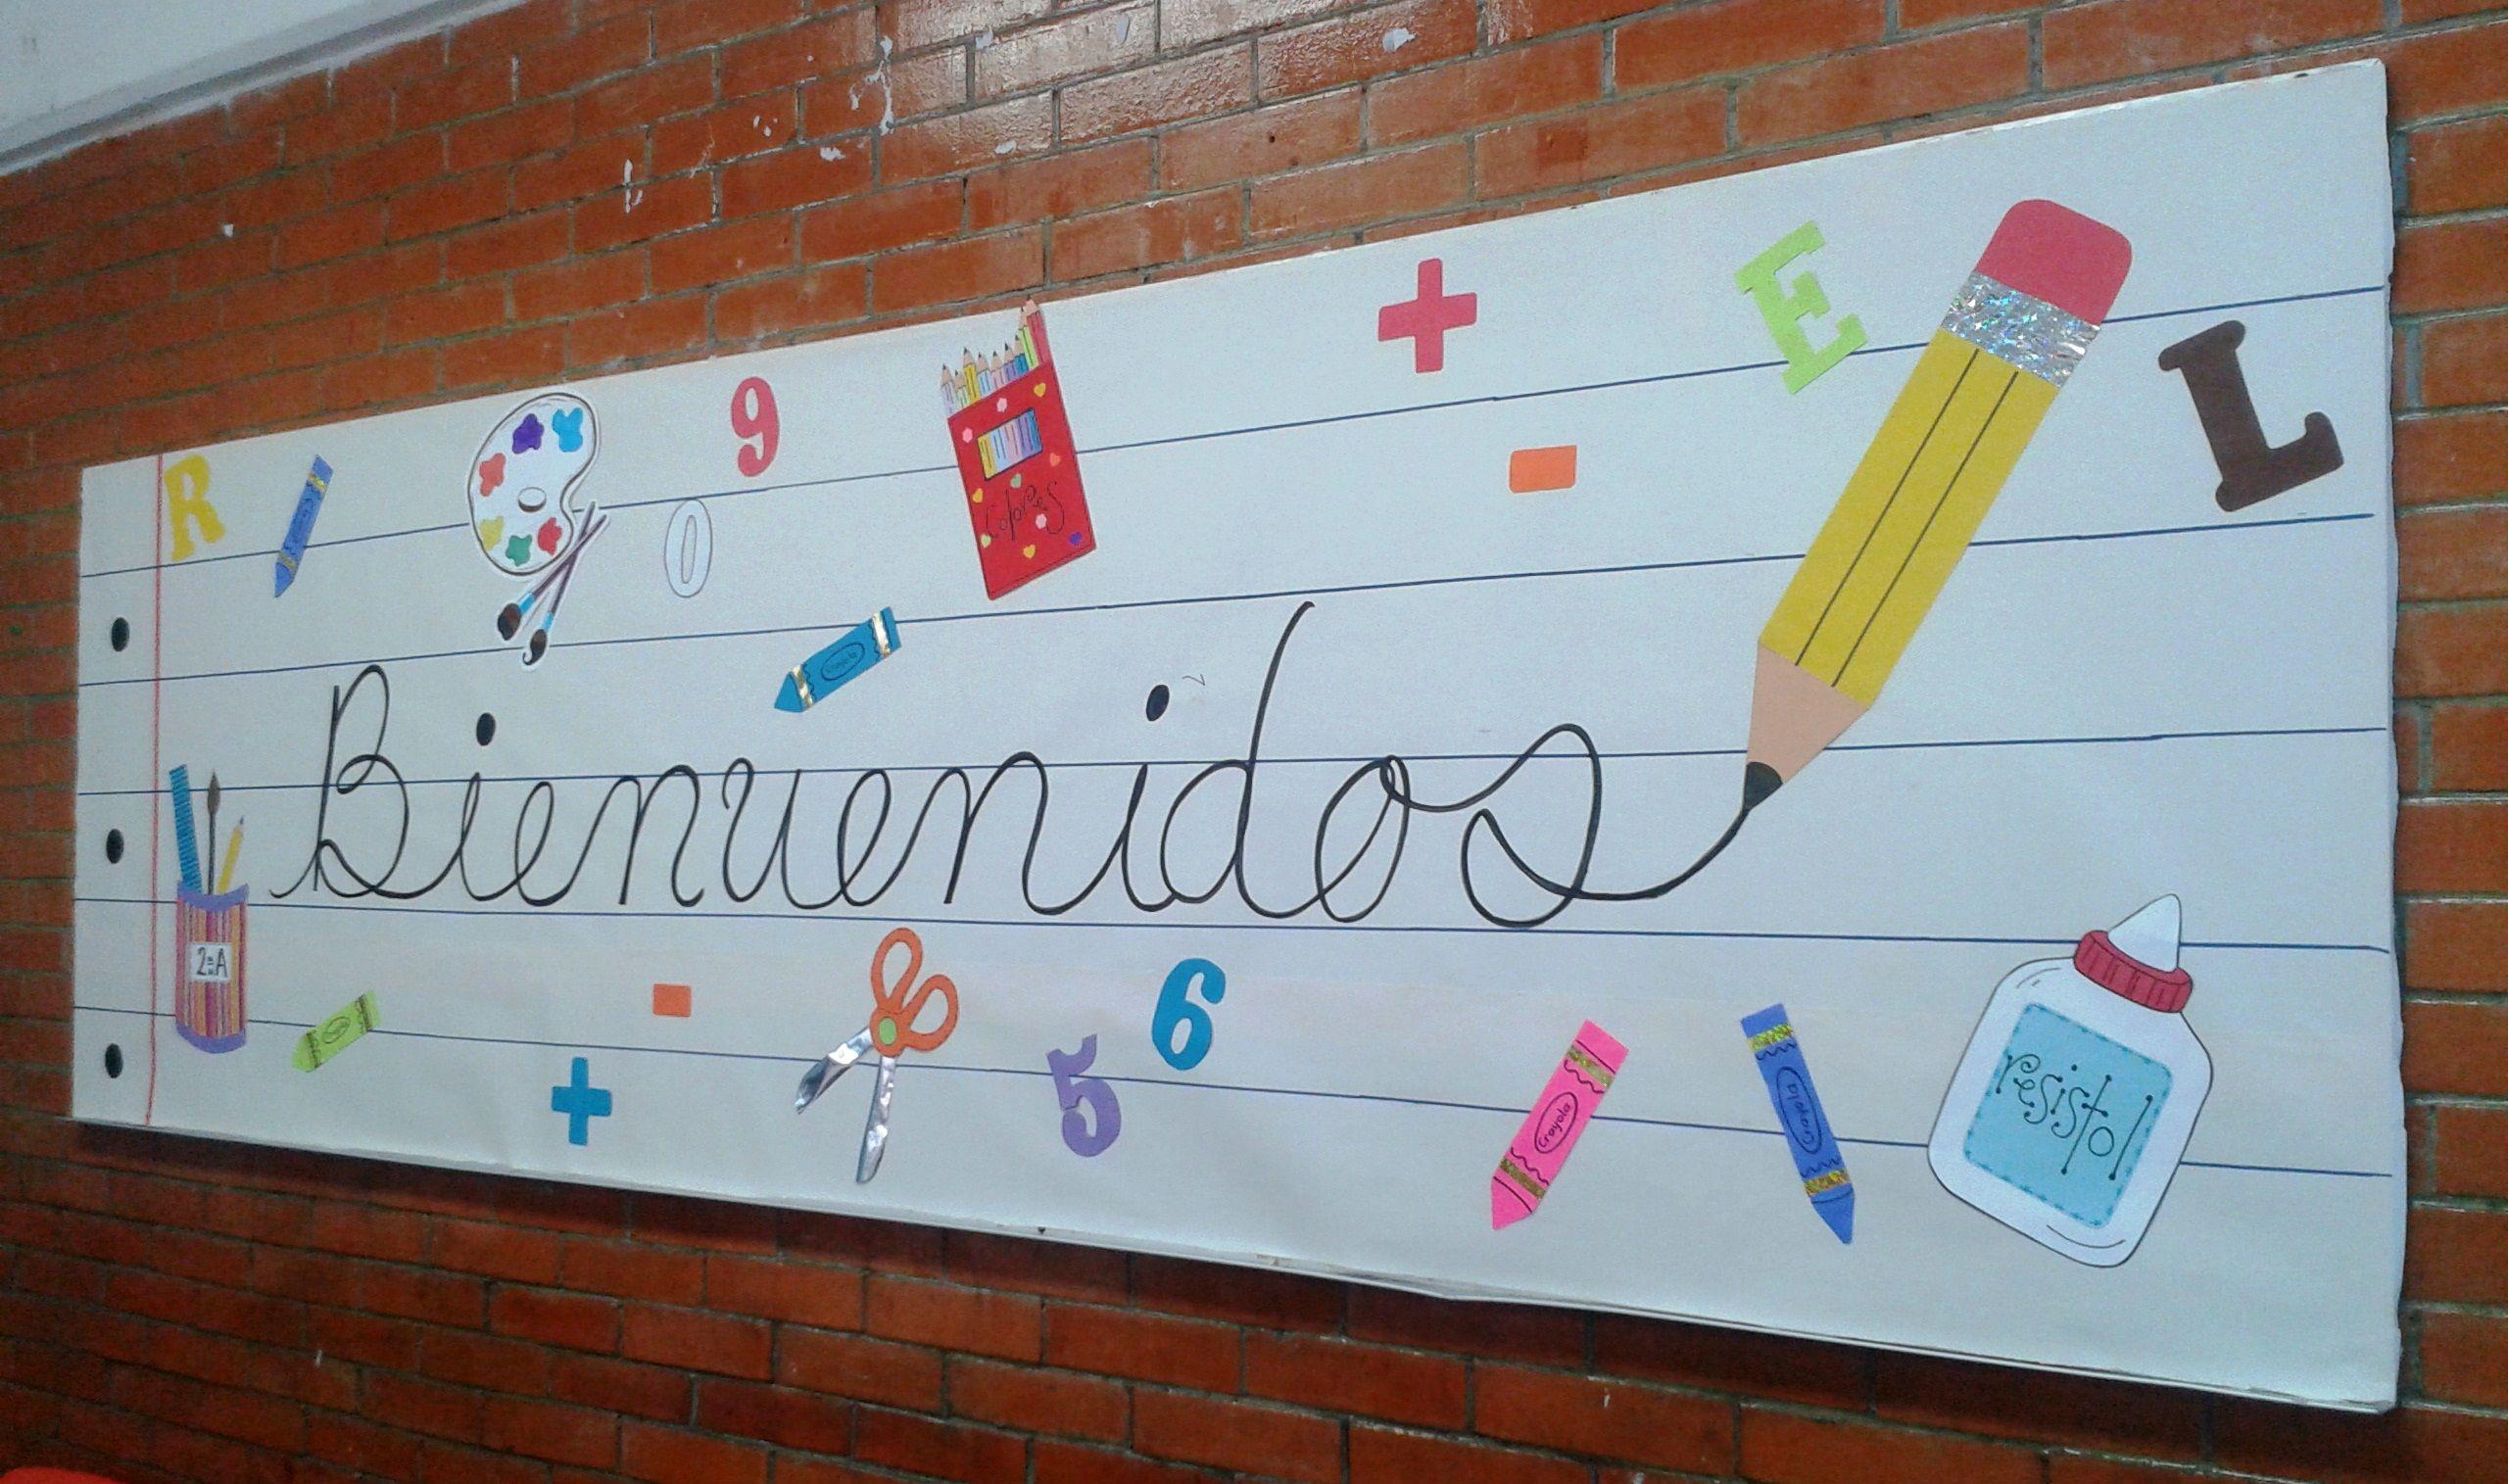 Periodico mural regreso a clases cole pinterest for Puertas decoradas para regreso a clases